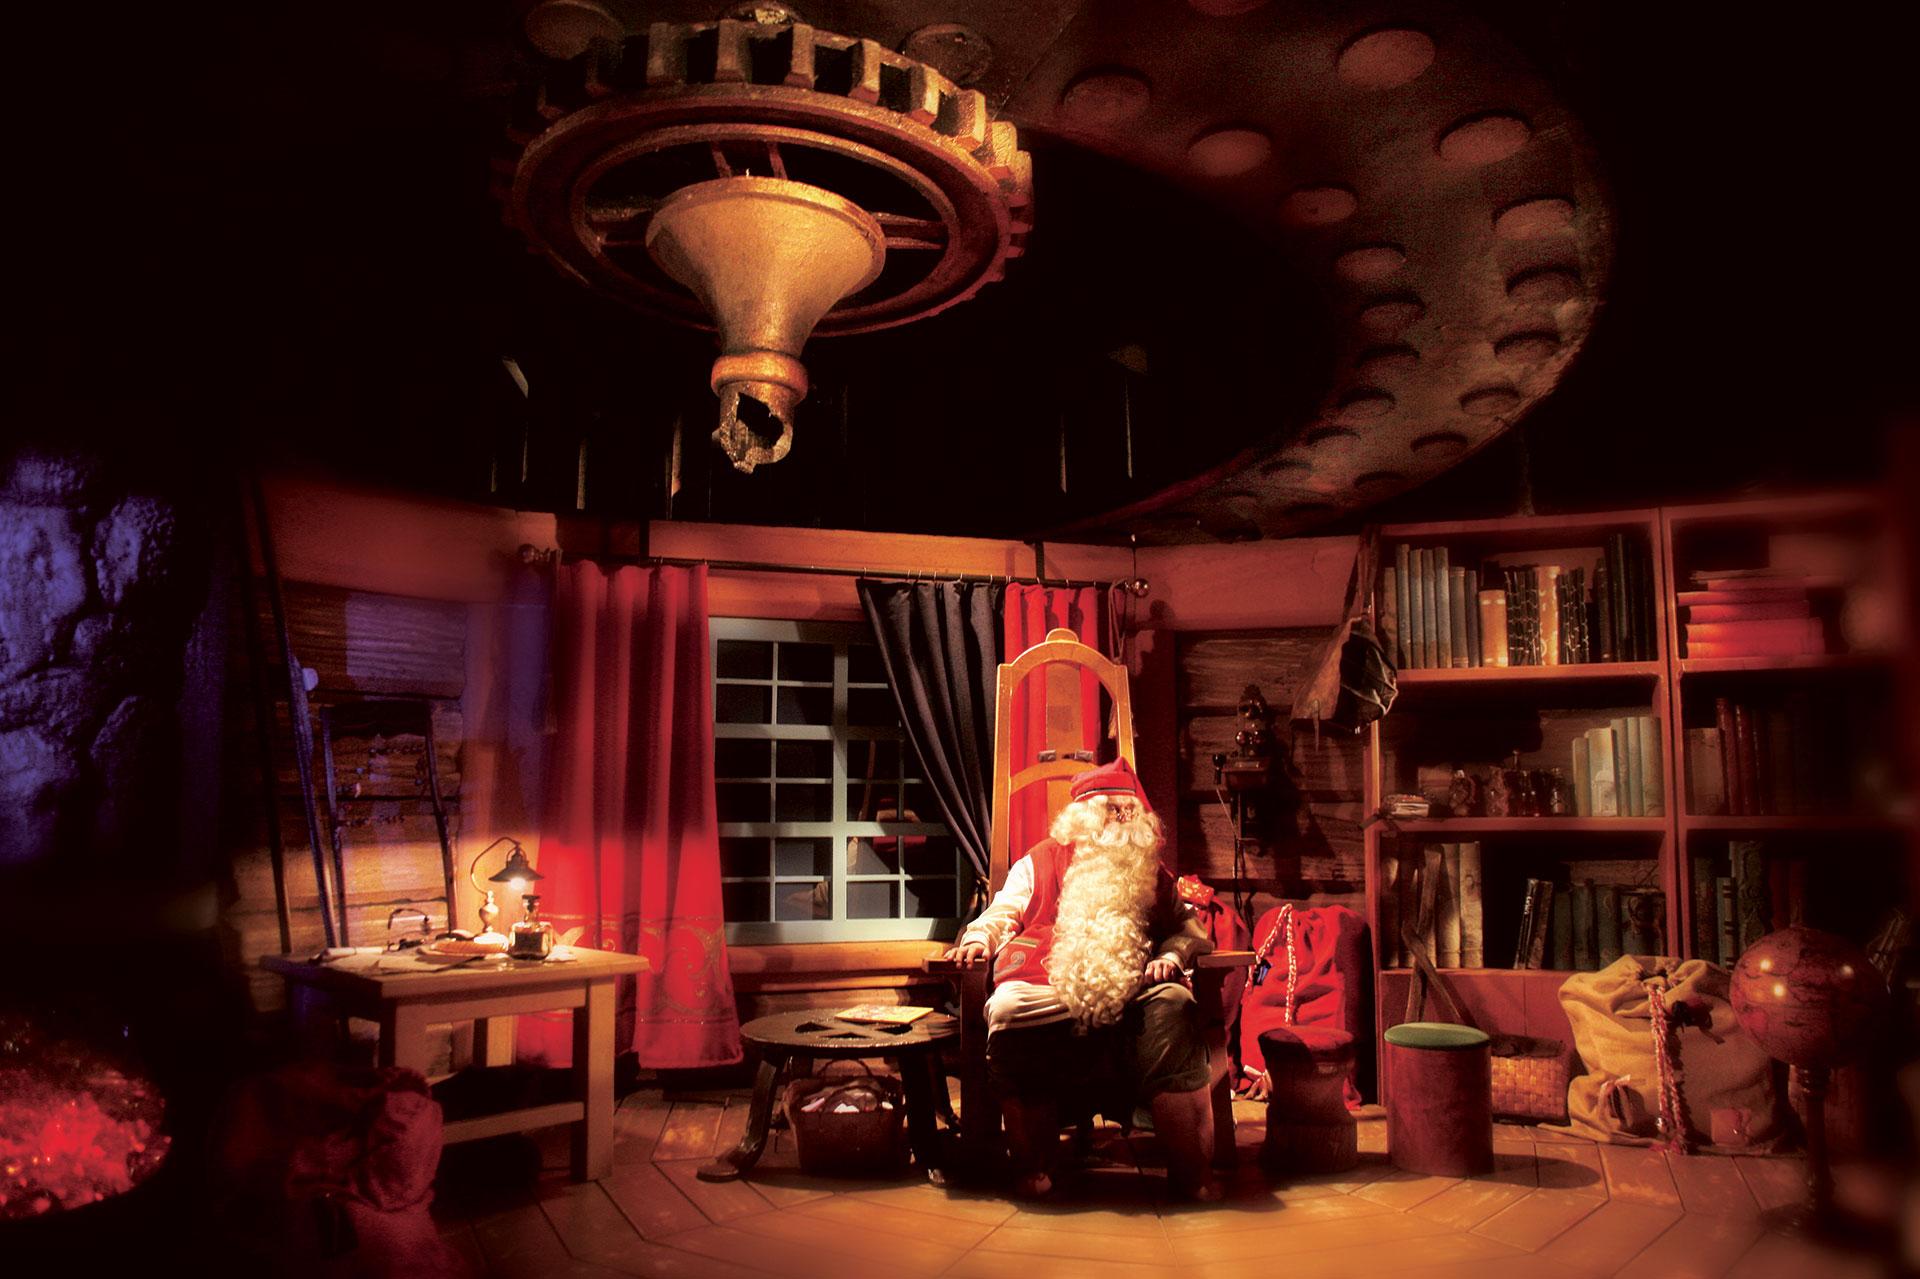 visit-rovaniemi-love-santa-claus-web-opt-2